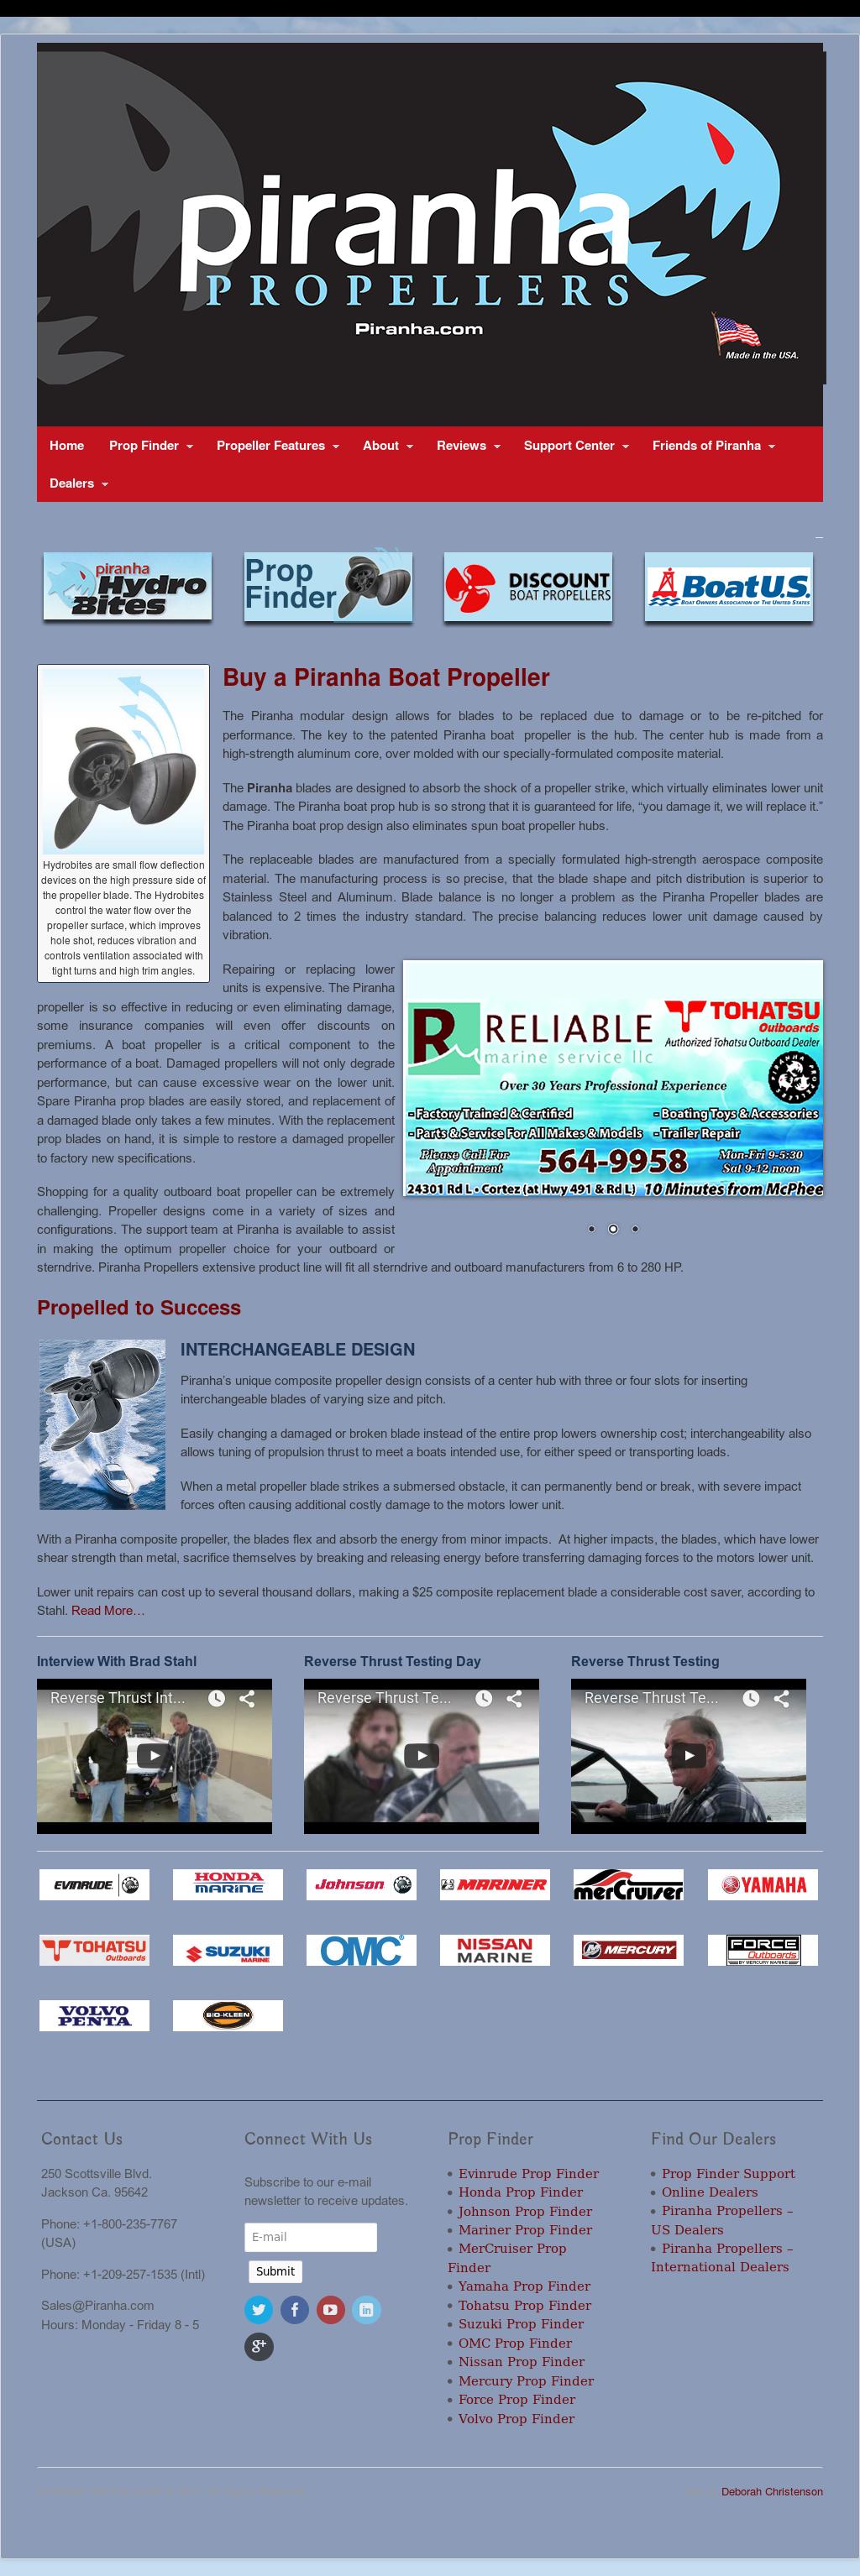 Piranha Competitors, Revenue and Employees - Owler Company